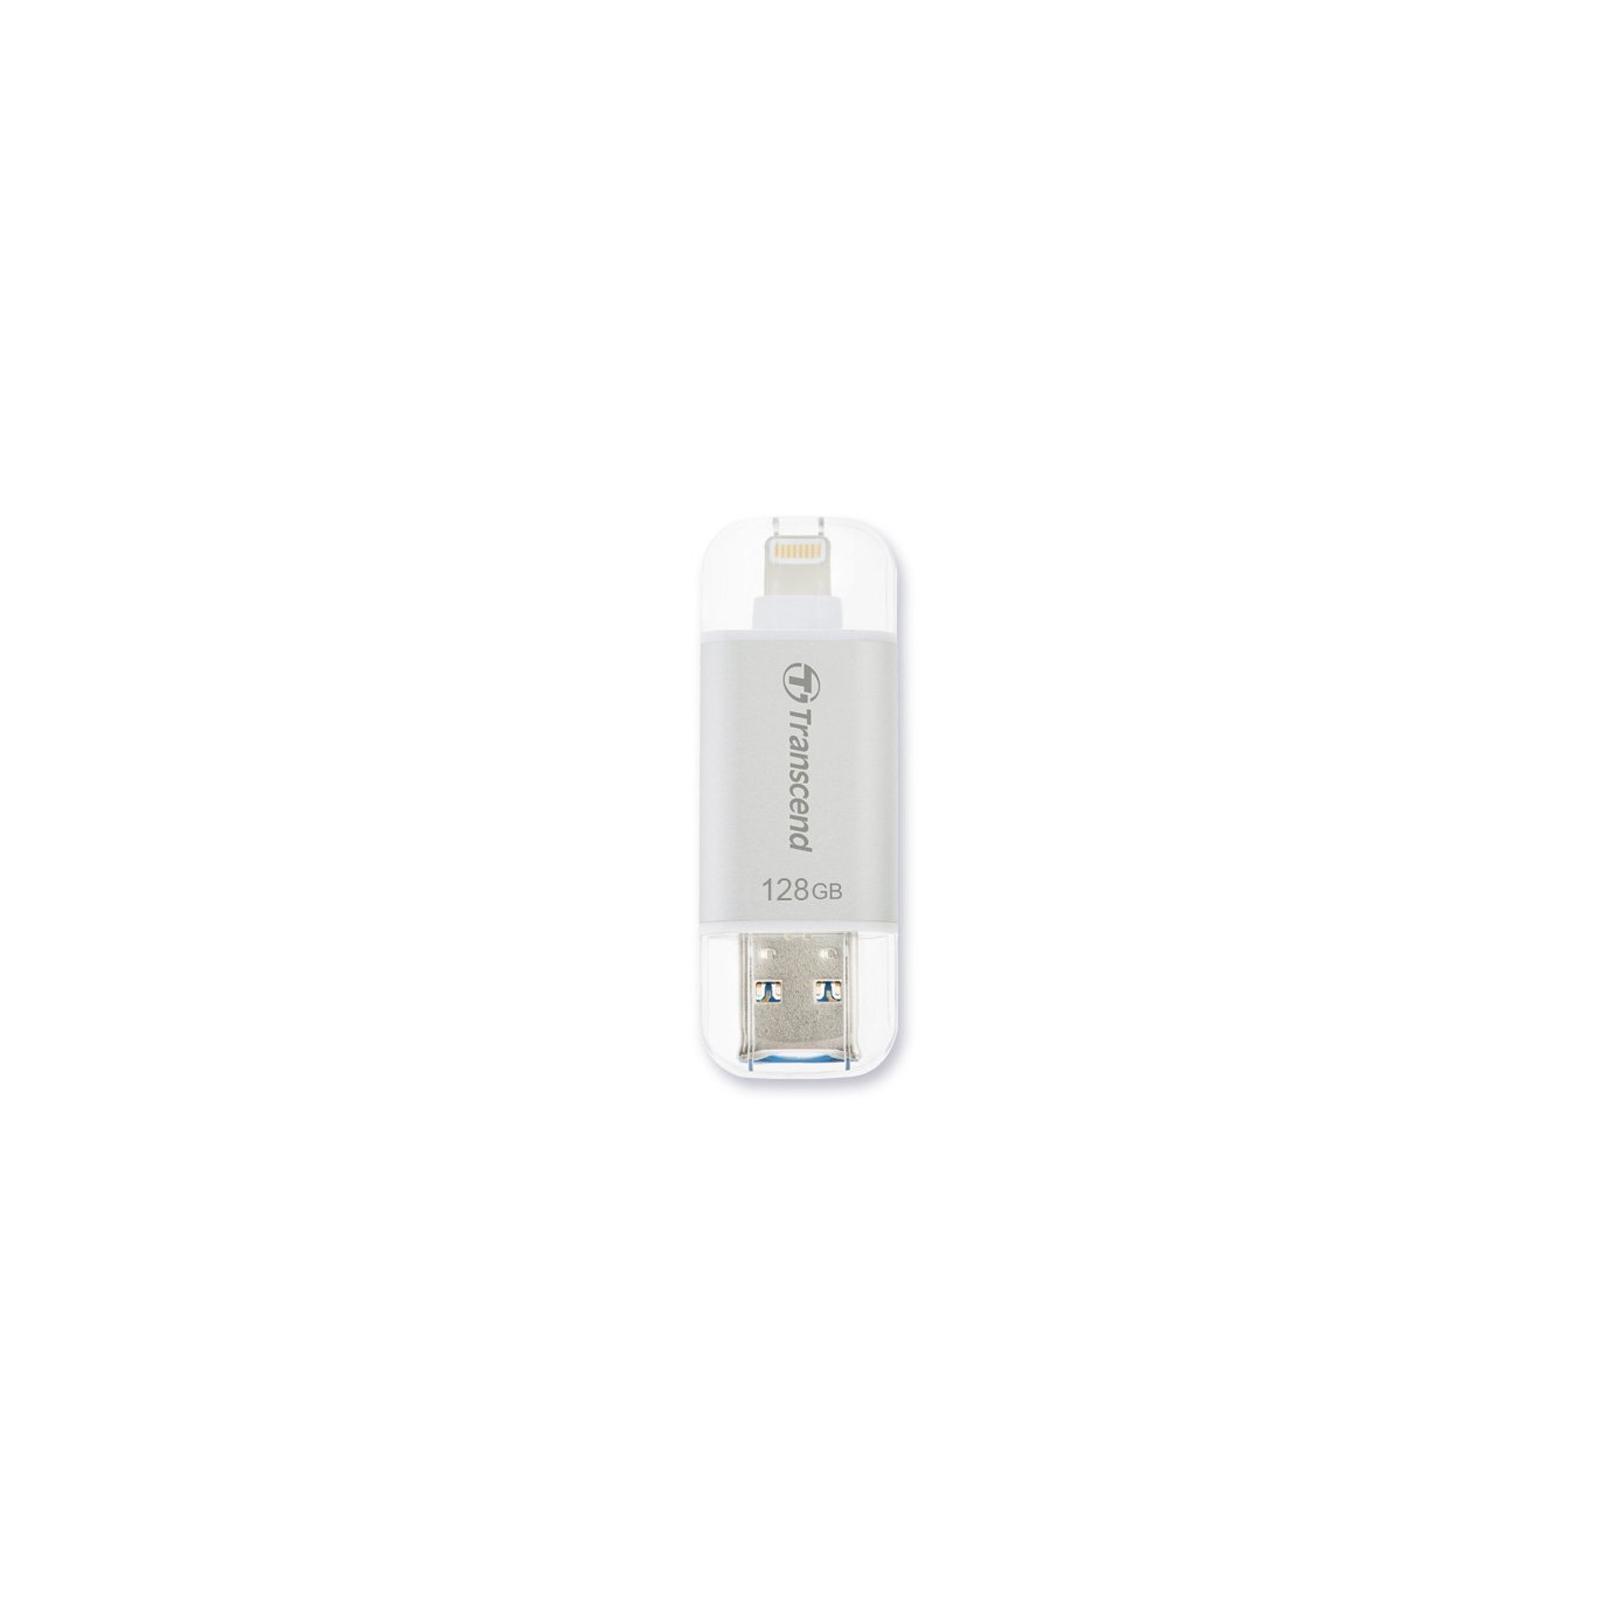 USB флеш накопитель Transcend 128GB JetDrive Go 300 Silver USB 3.1 (TS128GJDG300S)